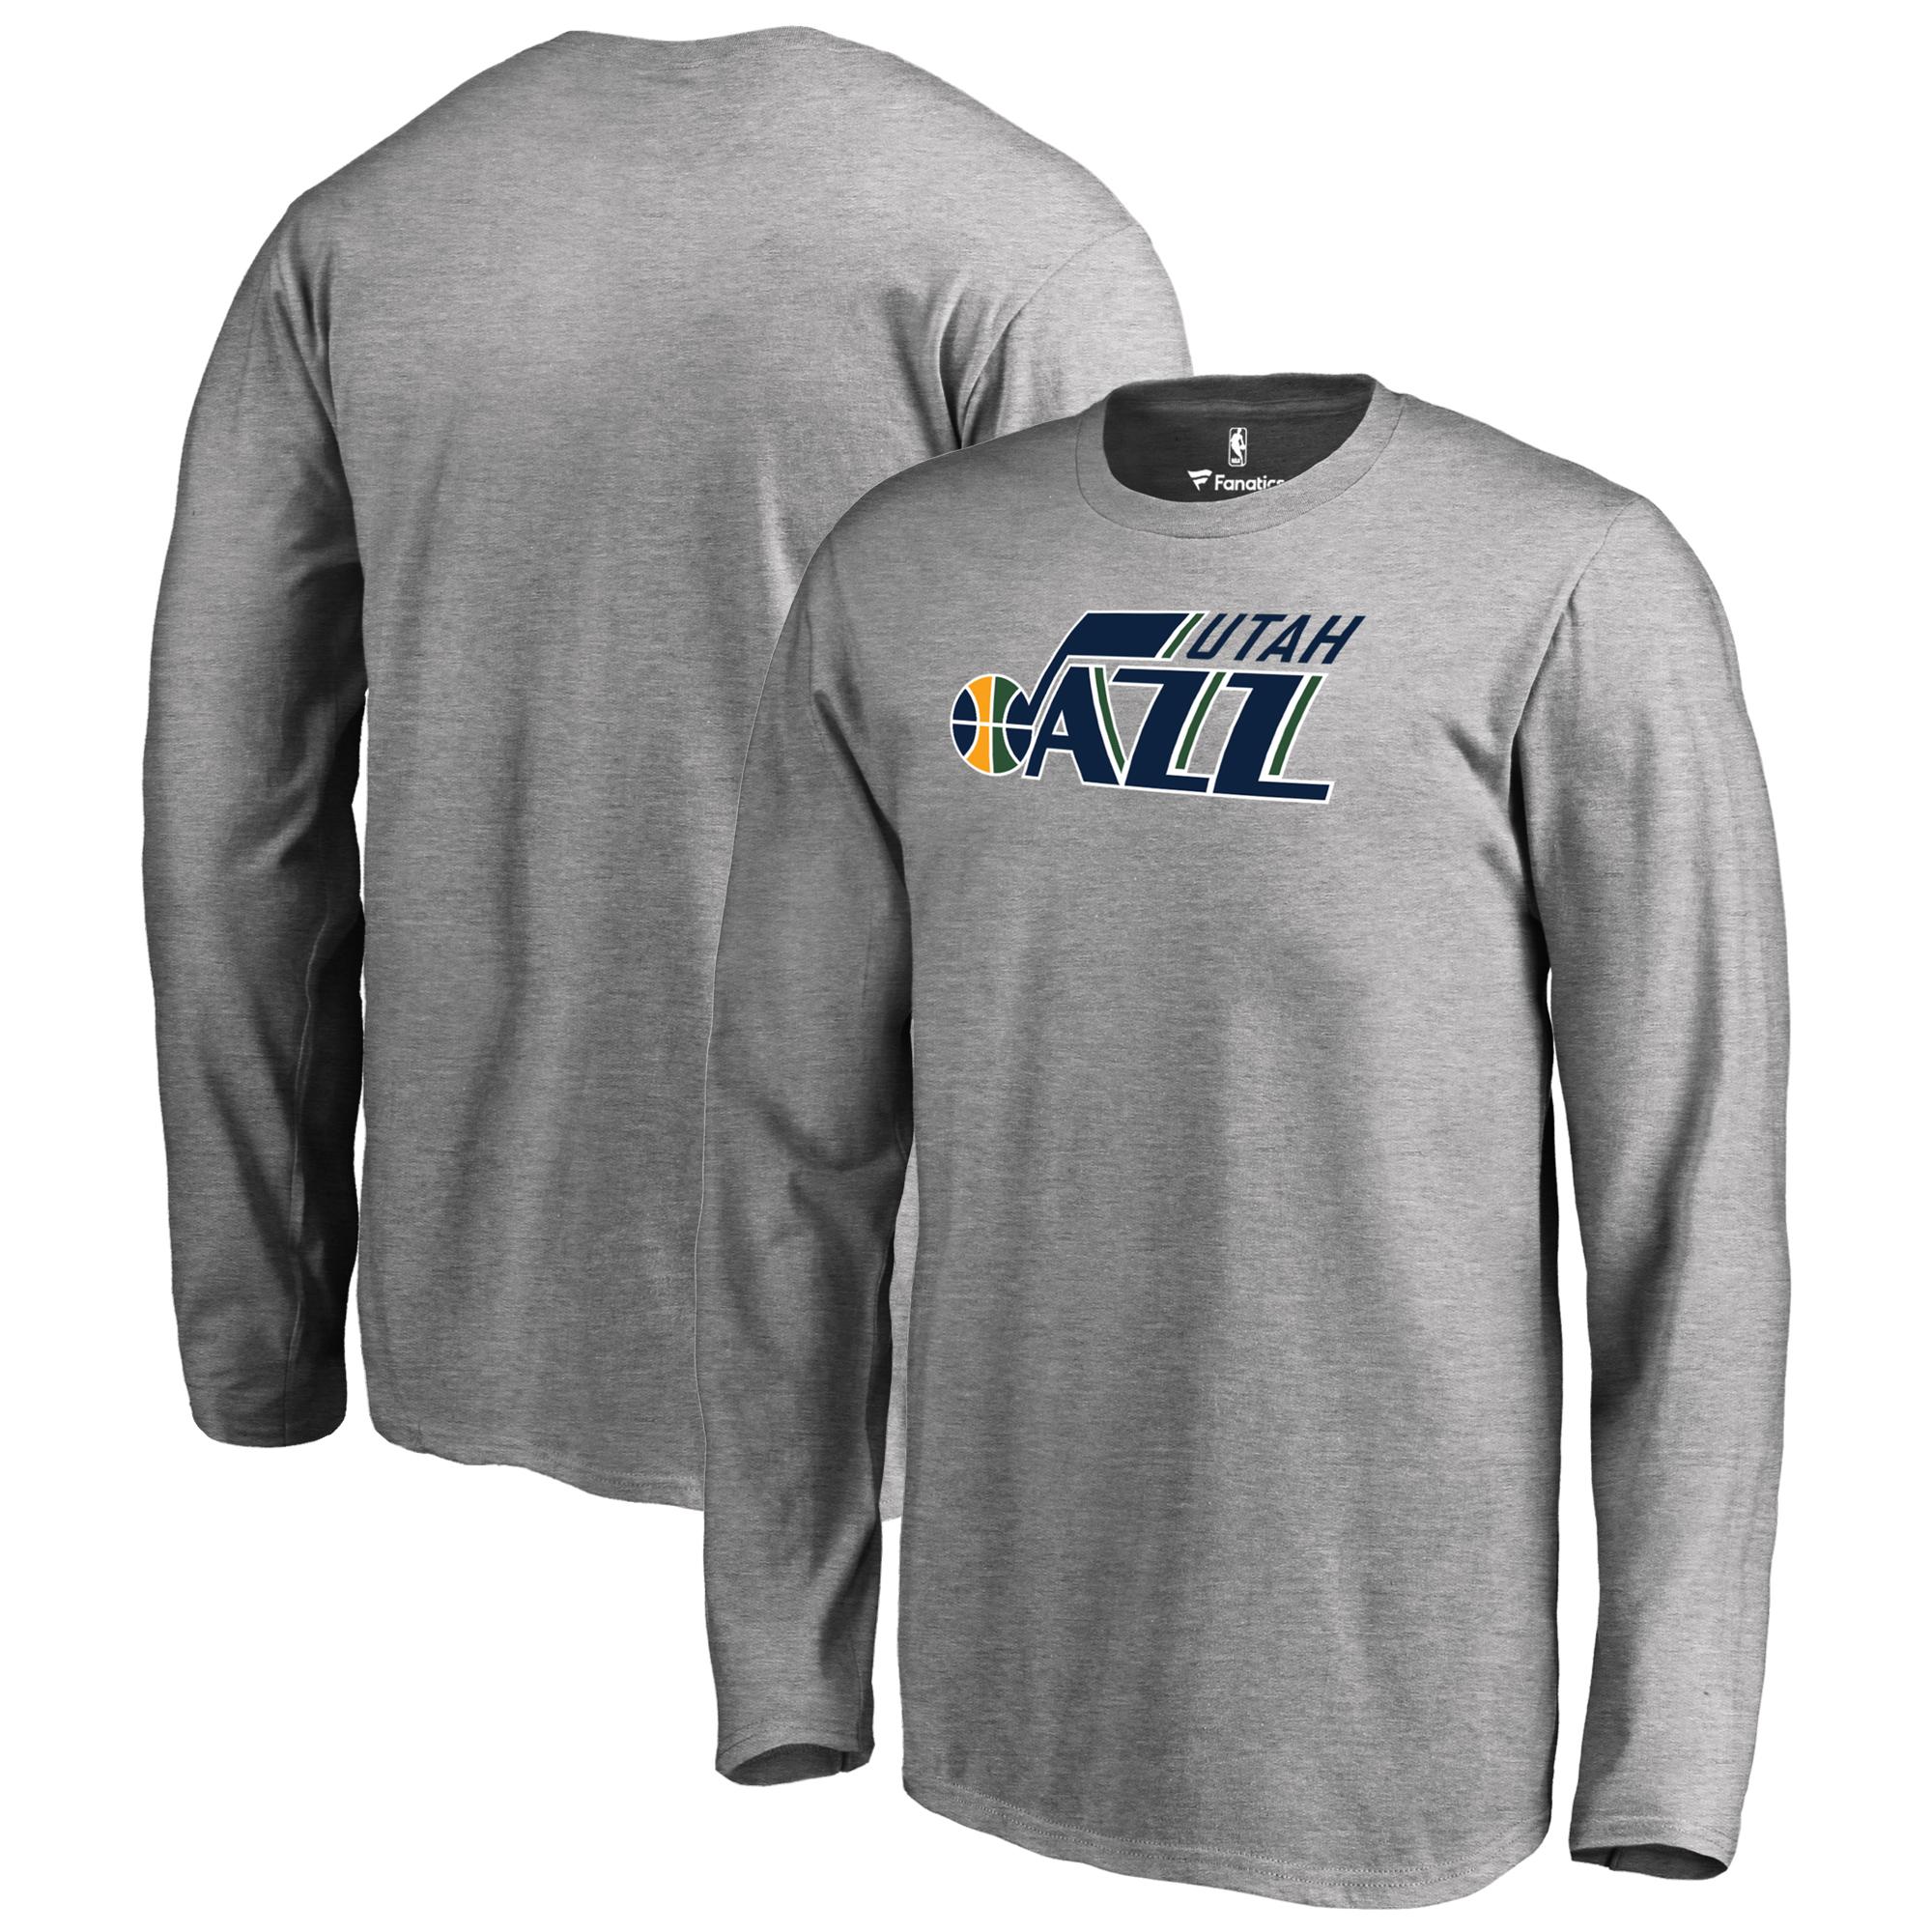 Utah Jazz Fanatics Branded Youth Primary Logo Long Sleeve T-Shirt - Heathered Gray